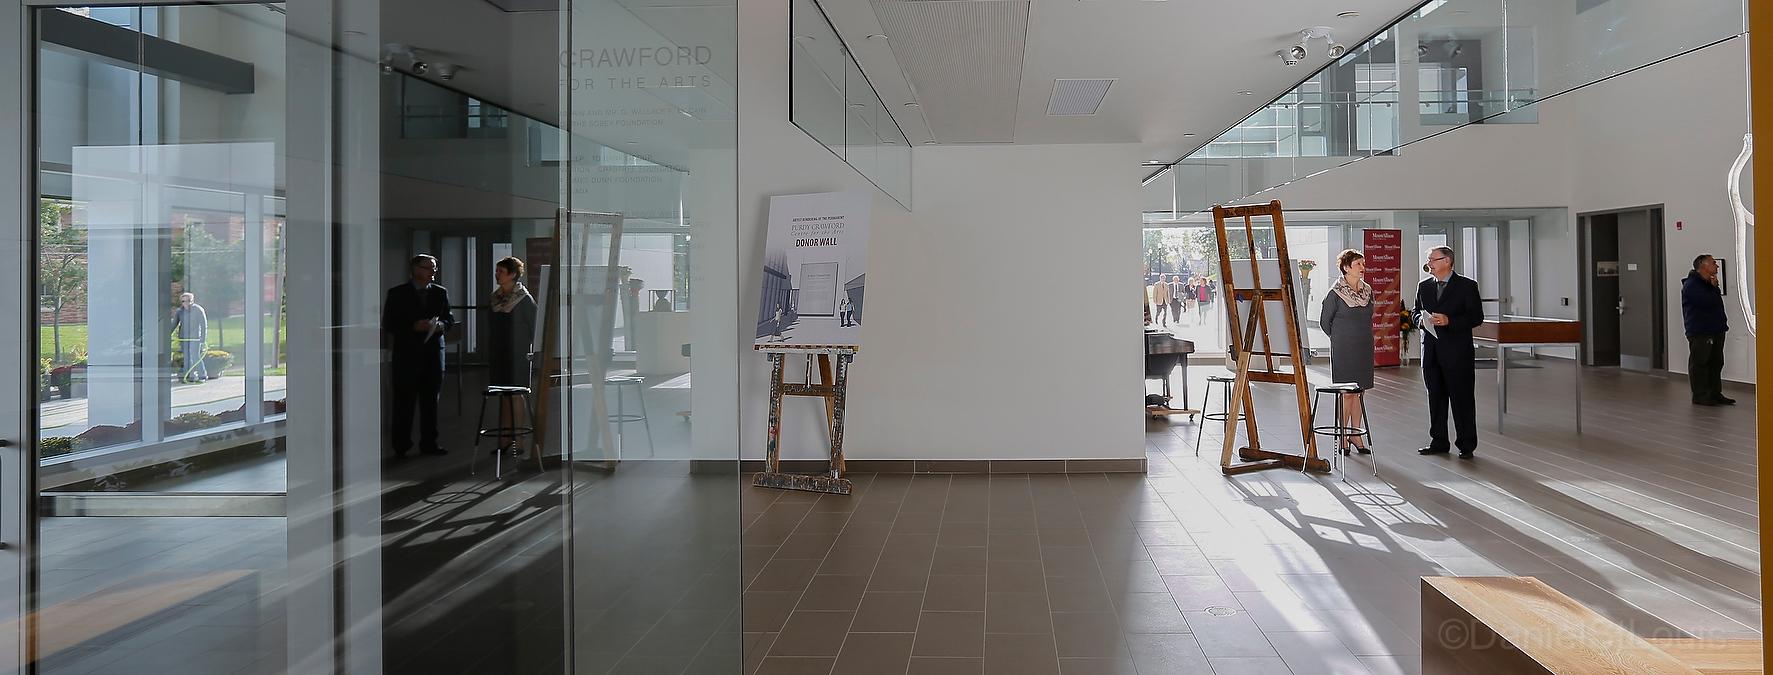 The Purdy Crawford Centre For The Arts Mount Allison University Daniel St Louis Commercial